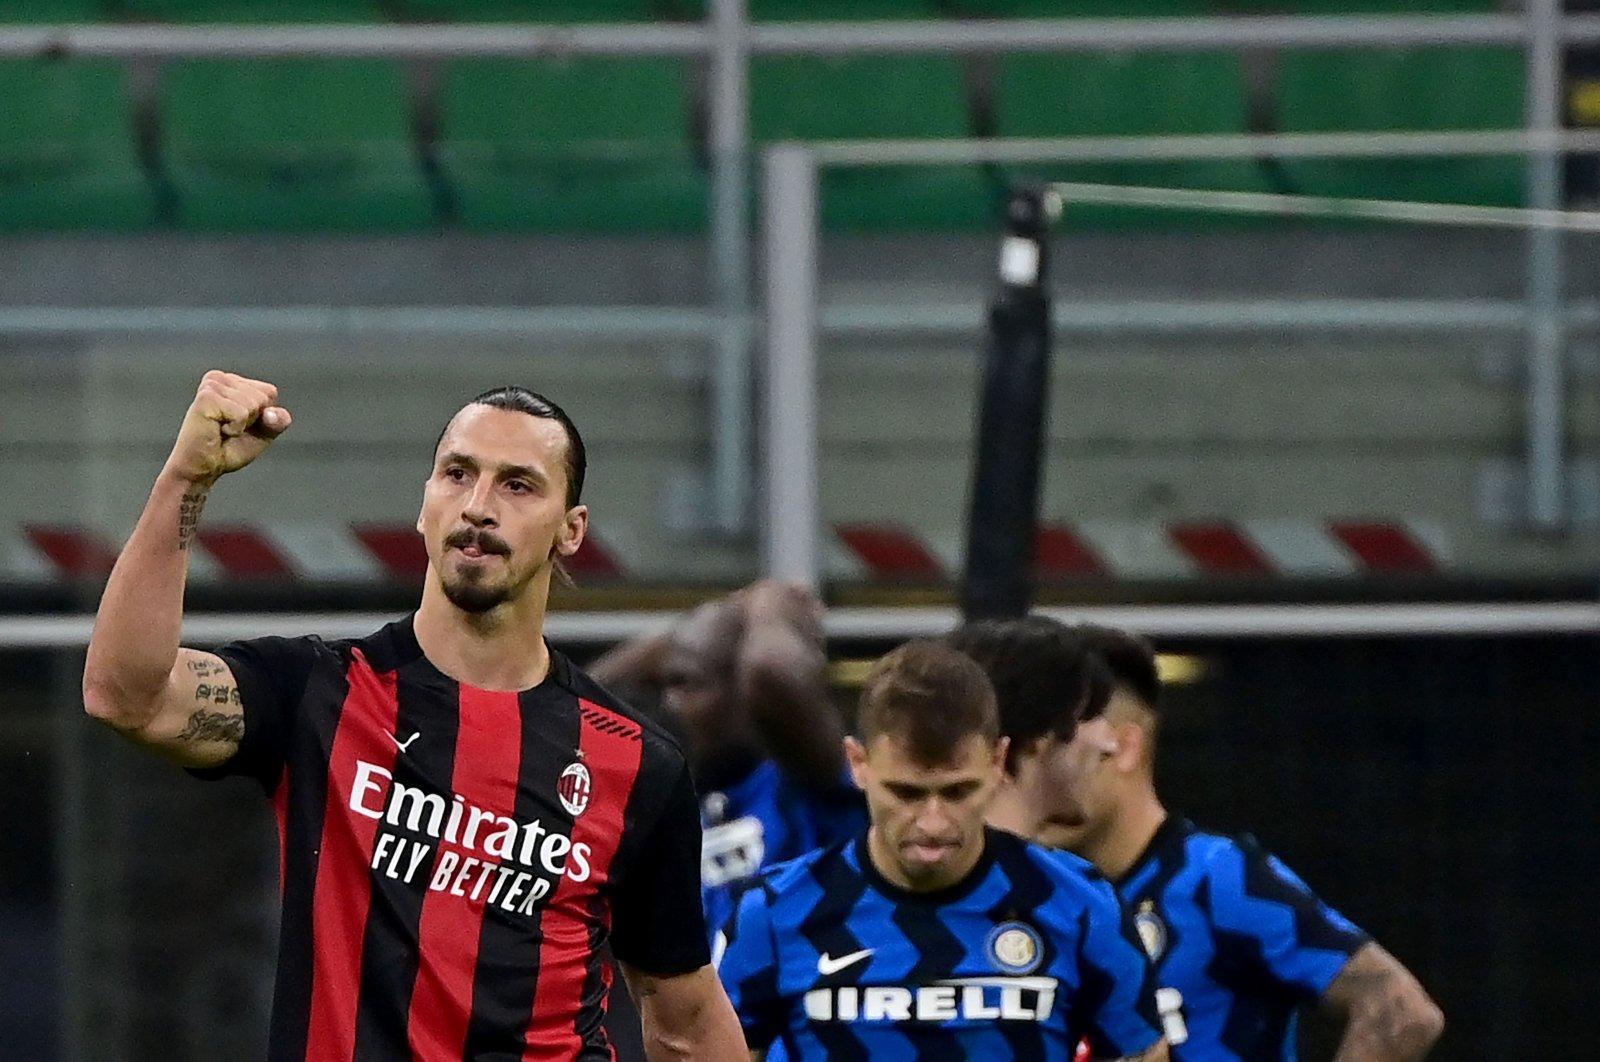 AC Milan Swedish forward Zlatan Ibrahimovic (L) celebrates after winning the Italian Serie A football match between Inter Milan and AC Milan at the San Siro stadium in Milan on Oct. 17, 2020. (AFP Photo)